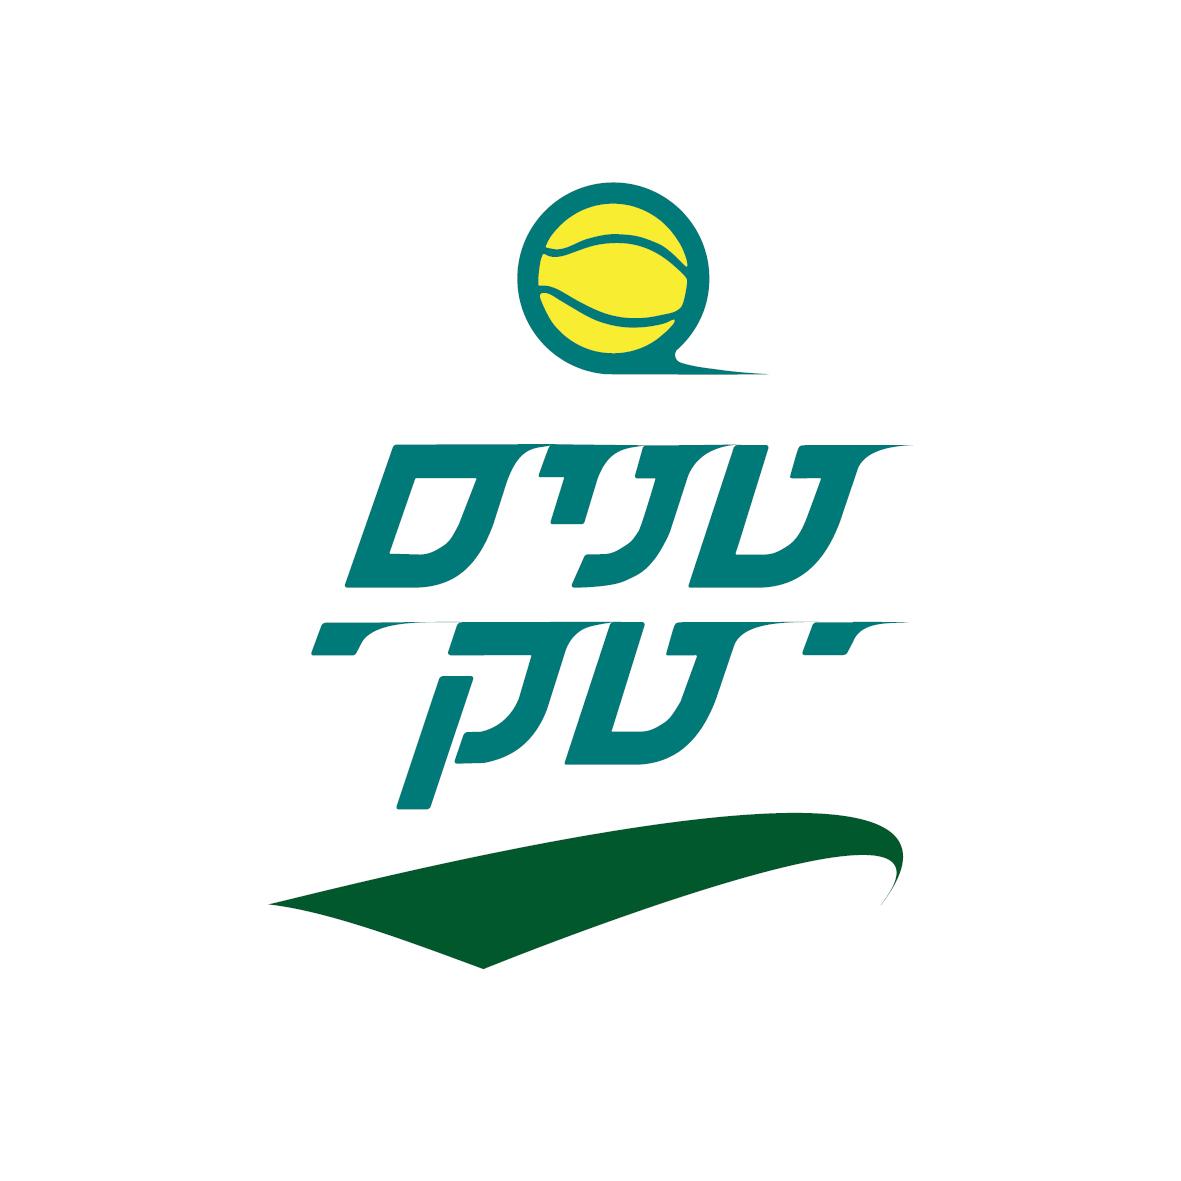 Logos_Michal Lifshitz Graphic Design__15.jpg